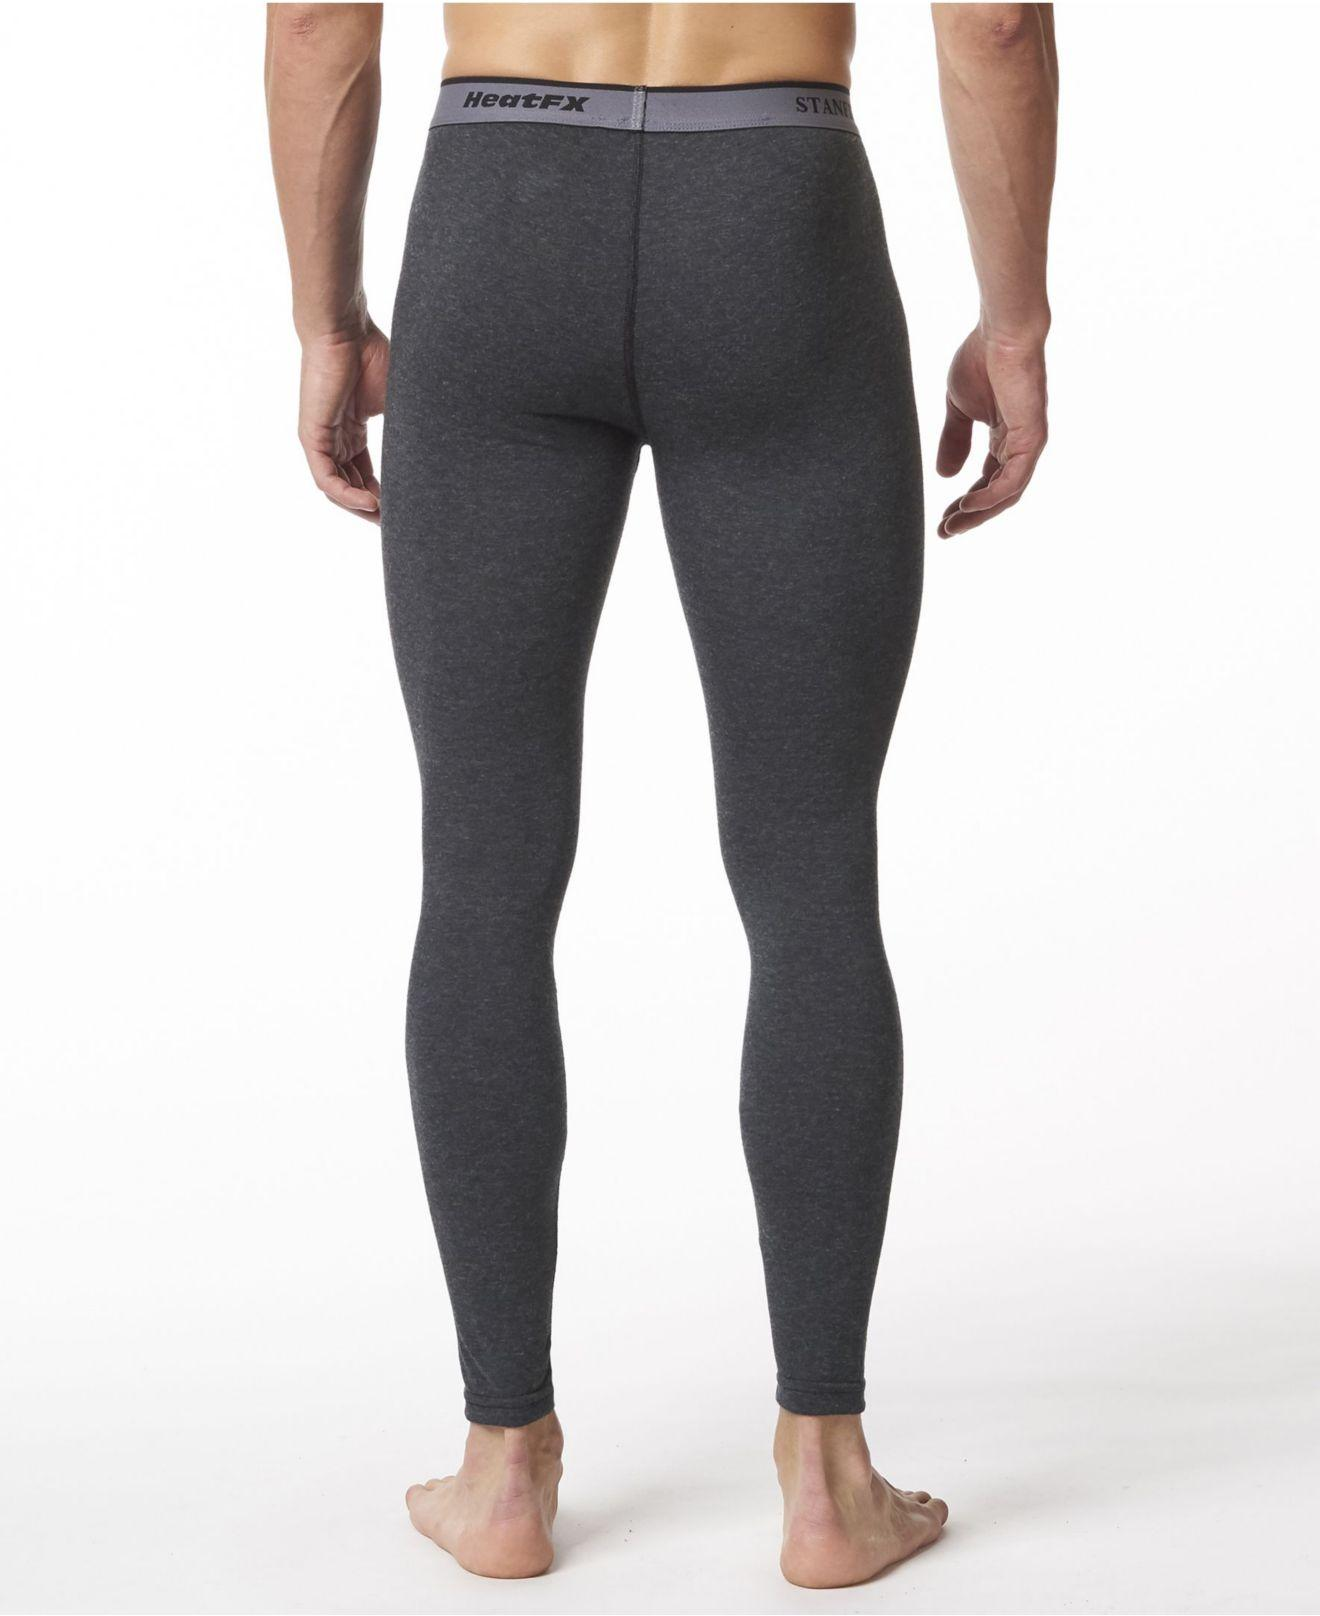 Stanfields Mens Premium Cotton Rib Thermal Long Sleeve Undershirt Underwear Grey Heather